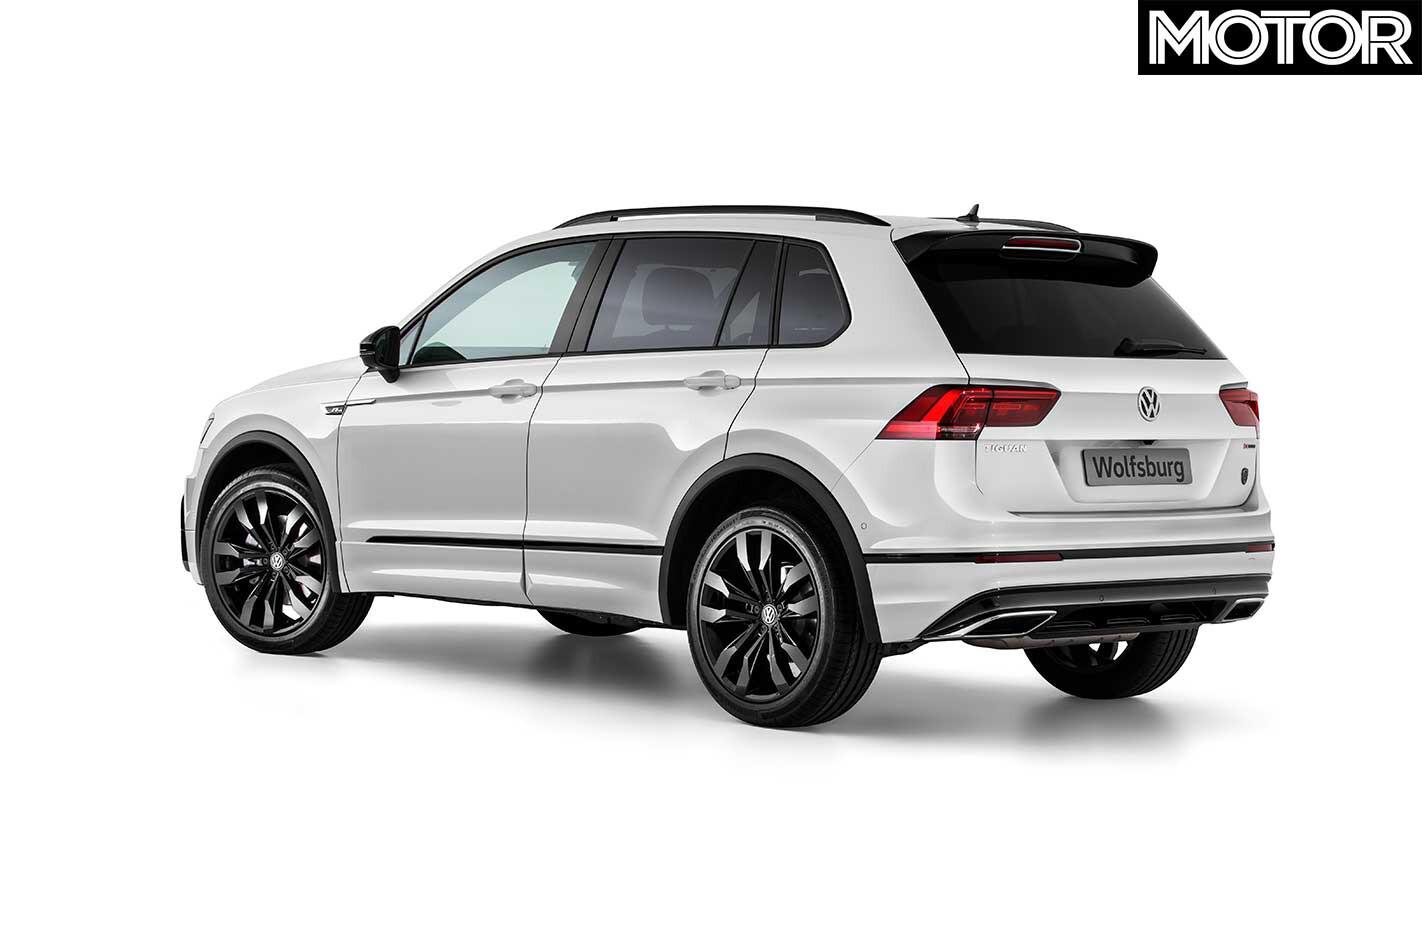 2018 Volkswagen Tiguan Wolfsburg Jpg